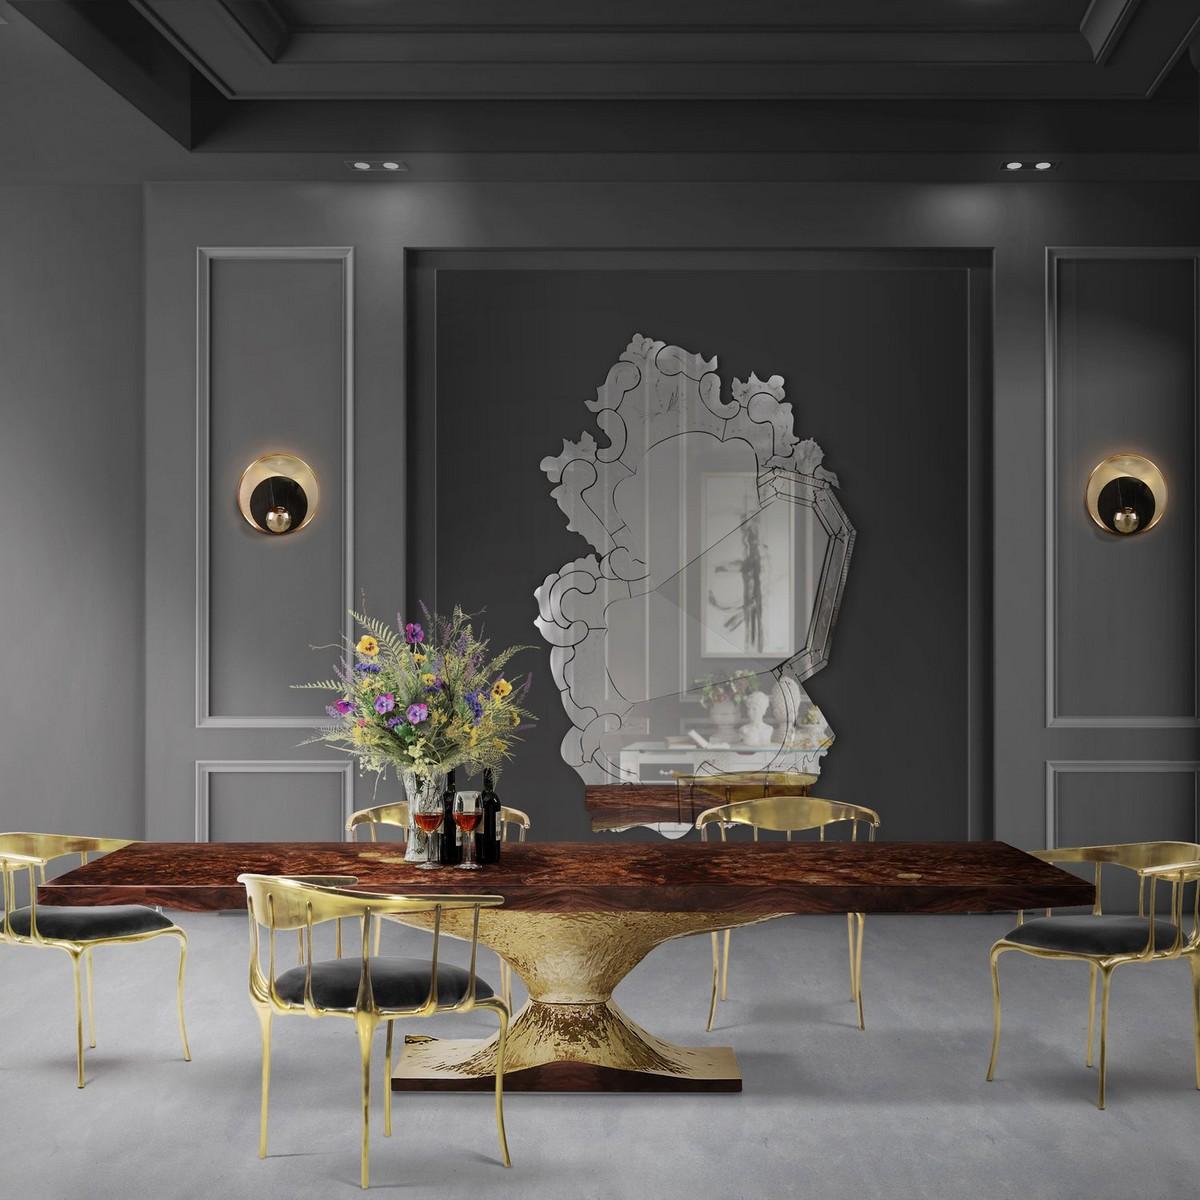 Exclusive Design: Top Rectangular Dining Tables rectangular dining tables Exclusive Design: Top Rectangular Dining Tables metamorphosis2